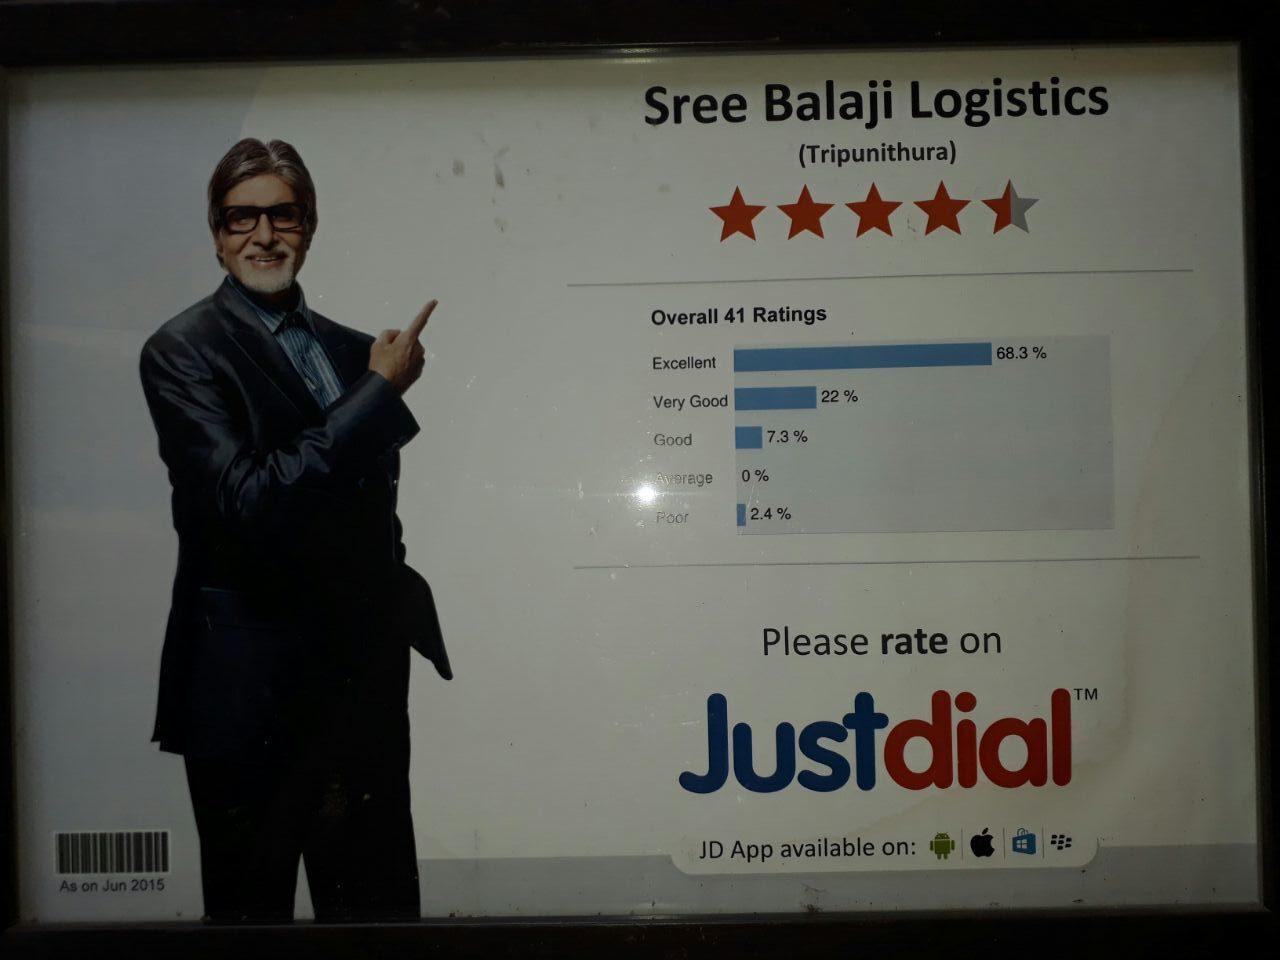 sree balaji logisctics